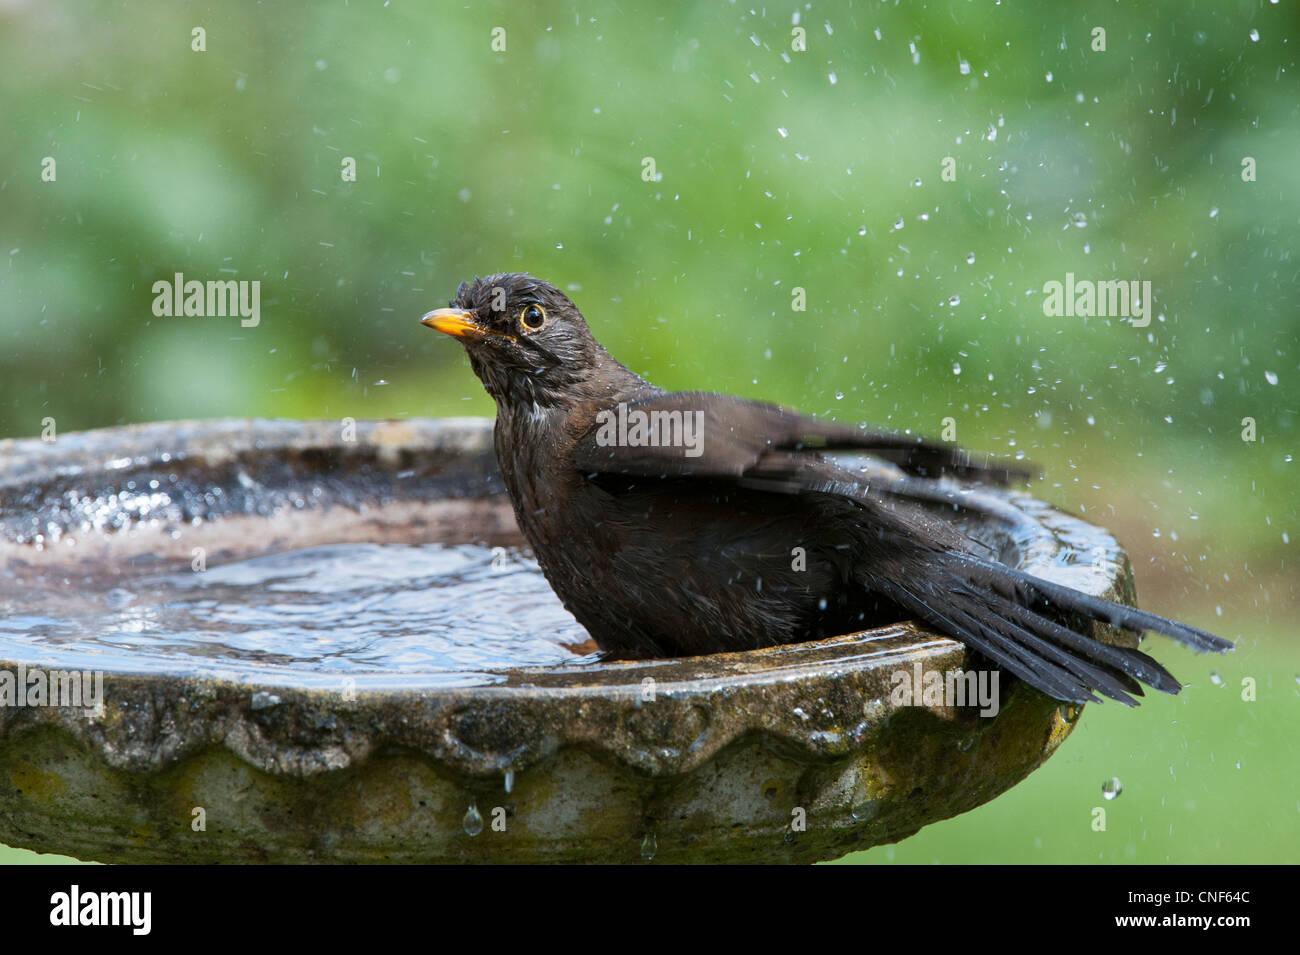 Turdus merula. Female blackbird washing in a bird bath - Stock Image